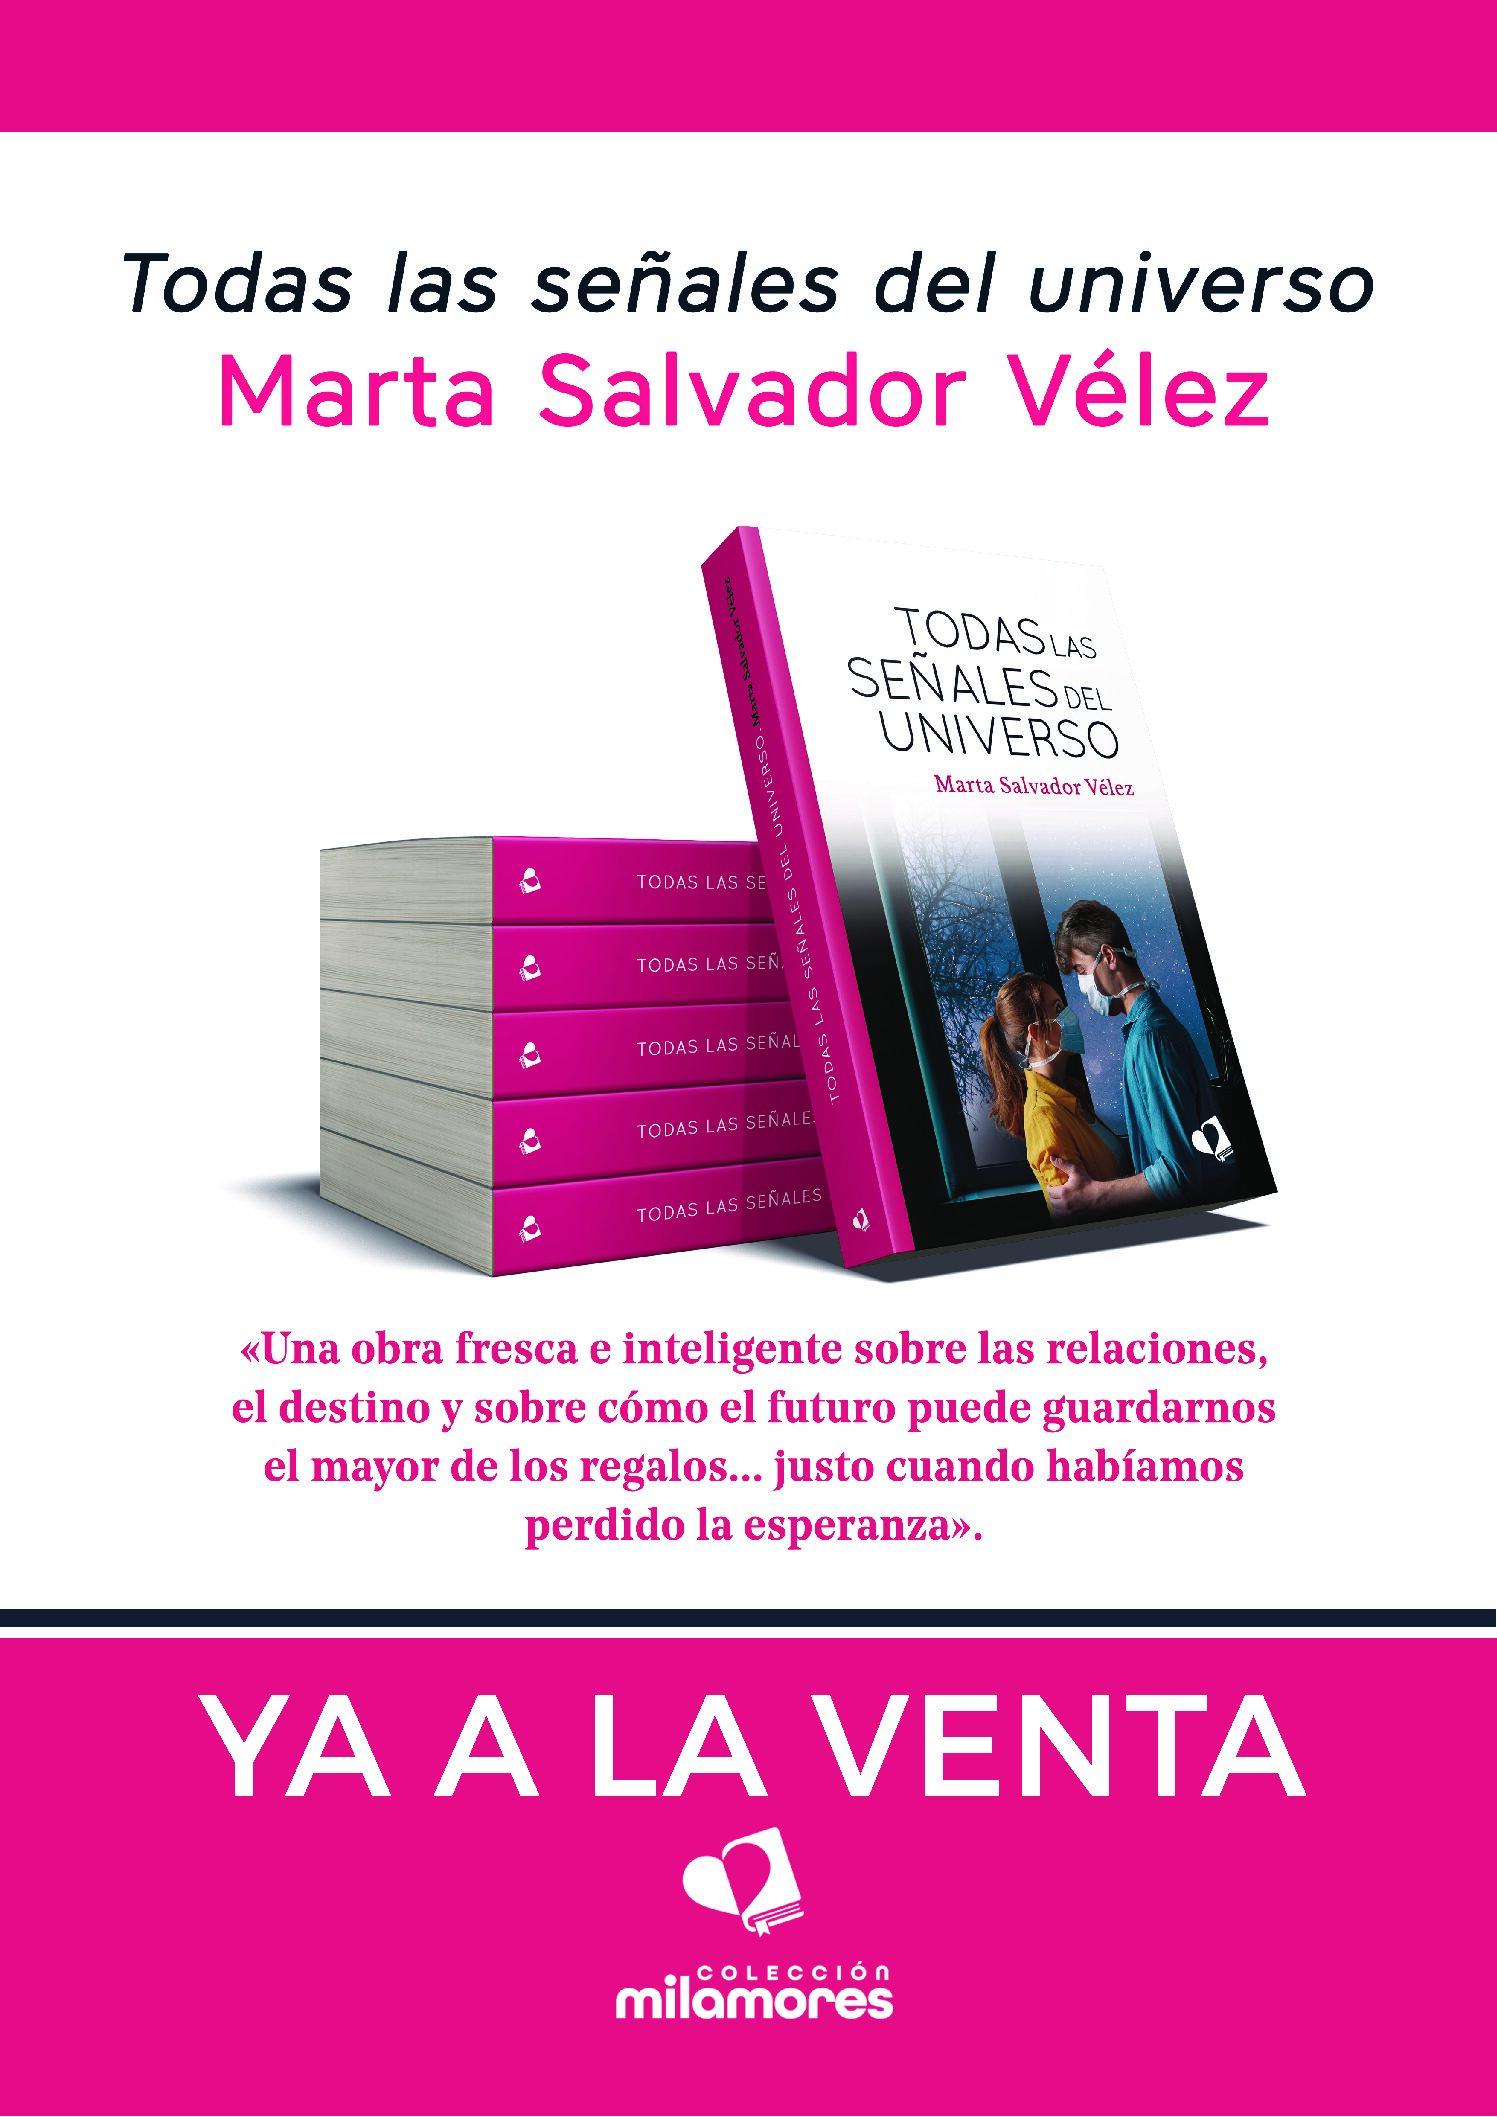 Se publica la nueva novela de nuestra profesora Marta Salvador Vélez